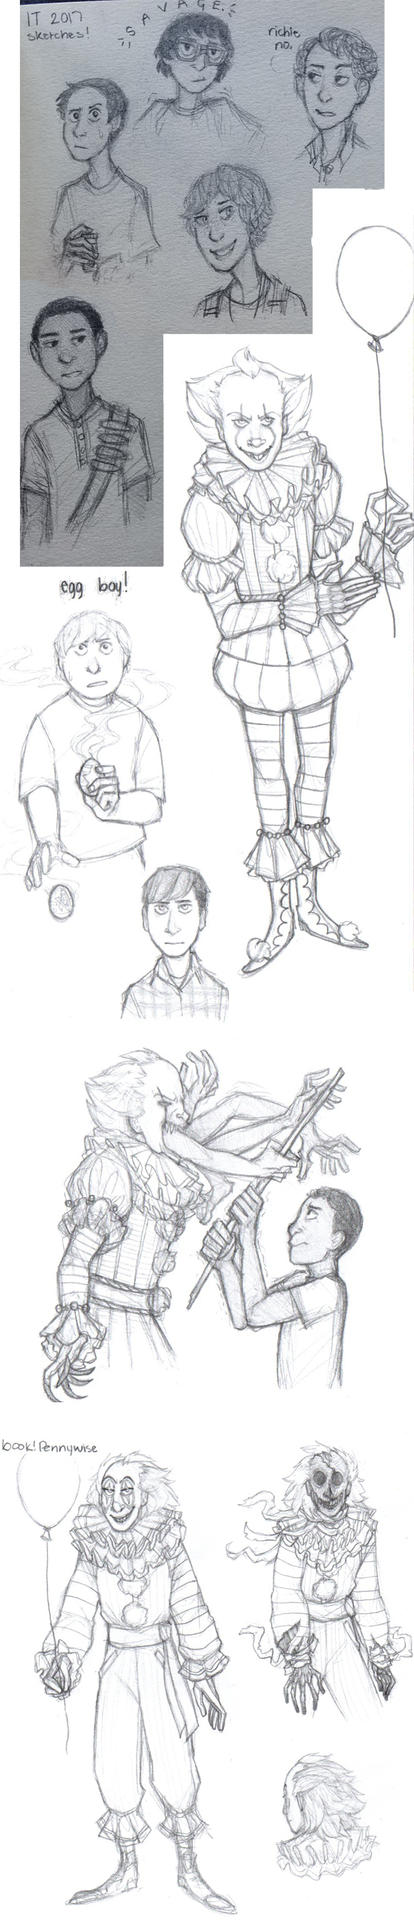 [IT] sketchdump by stephsin2kh